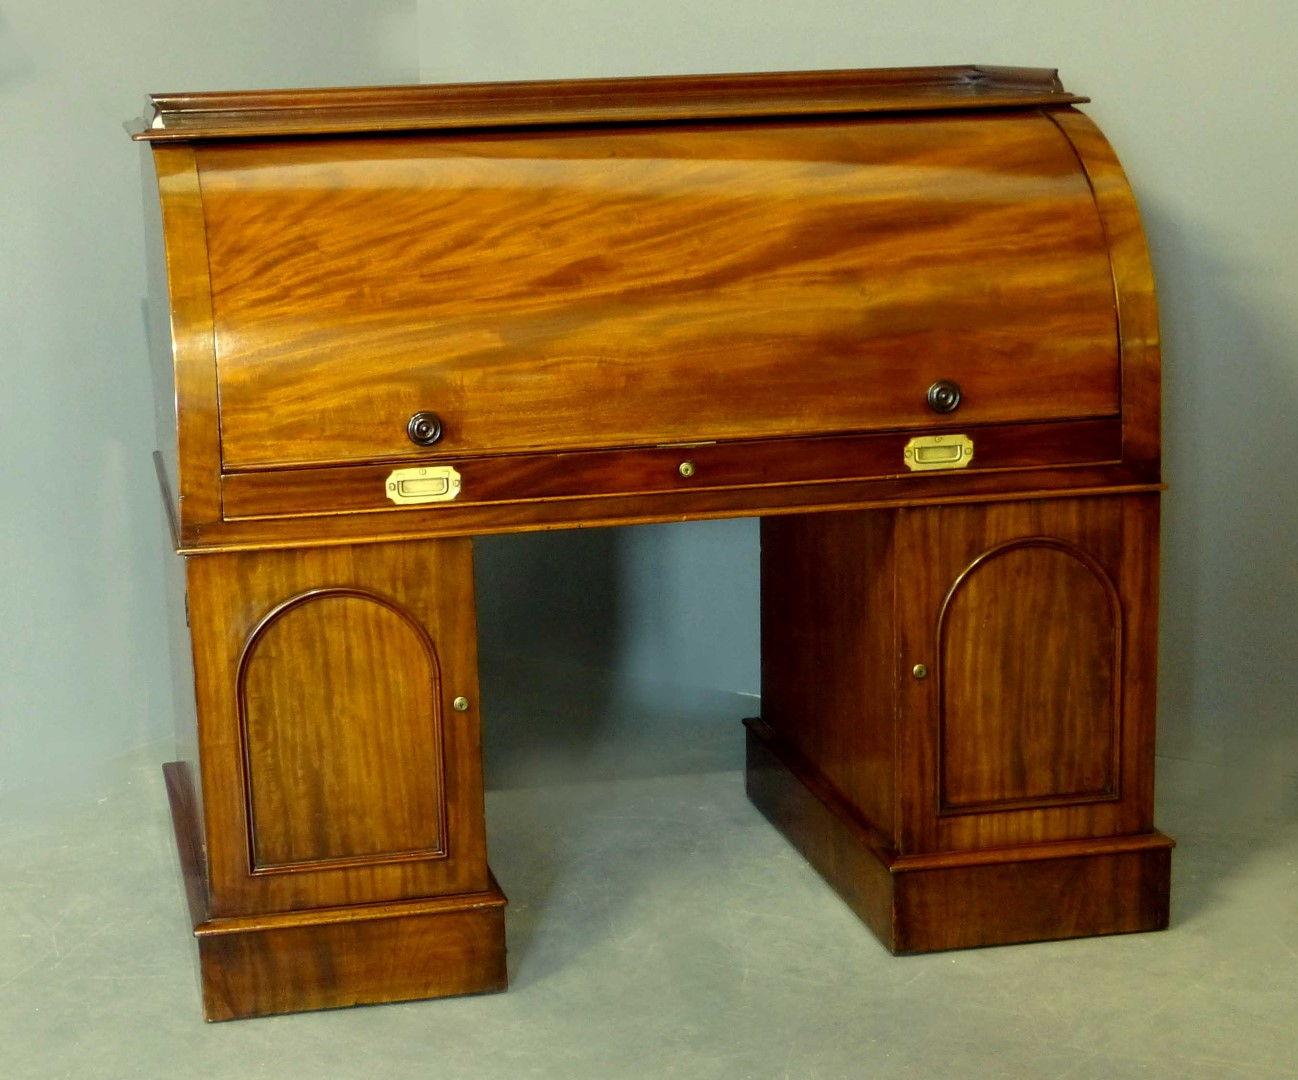 ... Antique Desk Cylinder Top x-Sir Stafford Cripps ... - Antique Furniture Antique Cupboards Antique Tables Antique